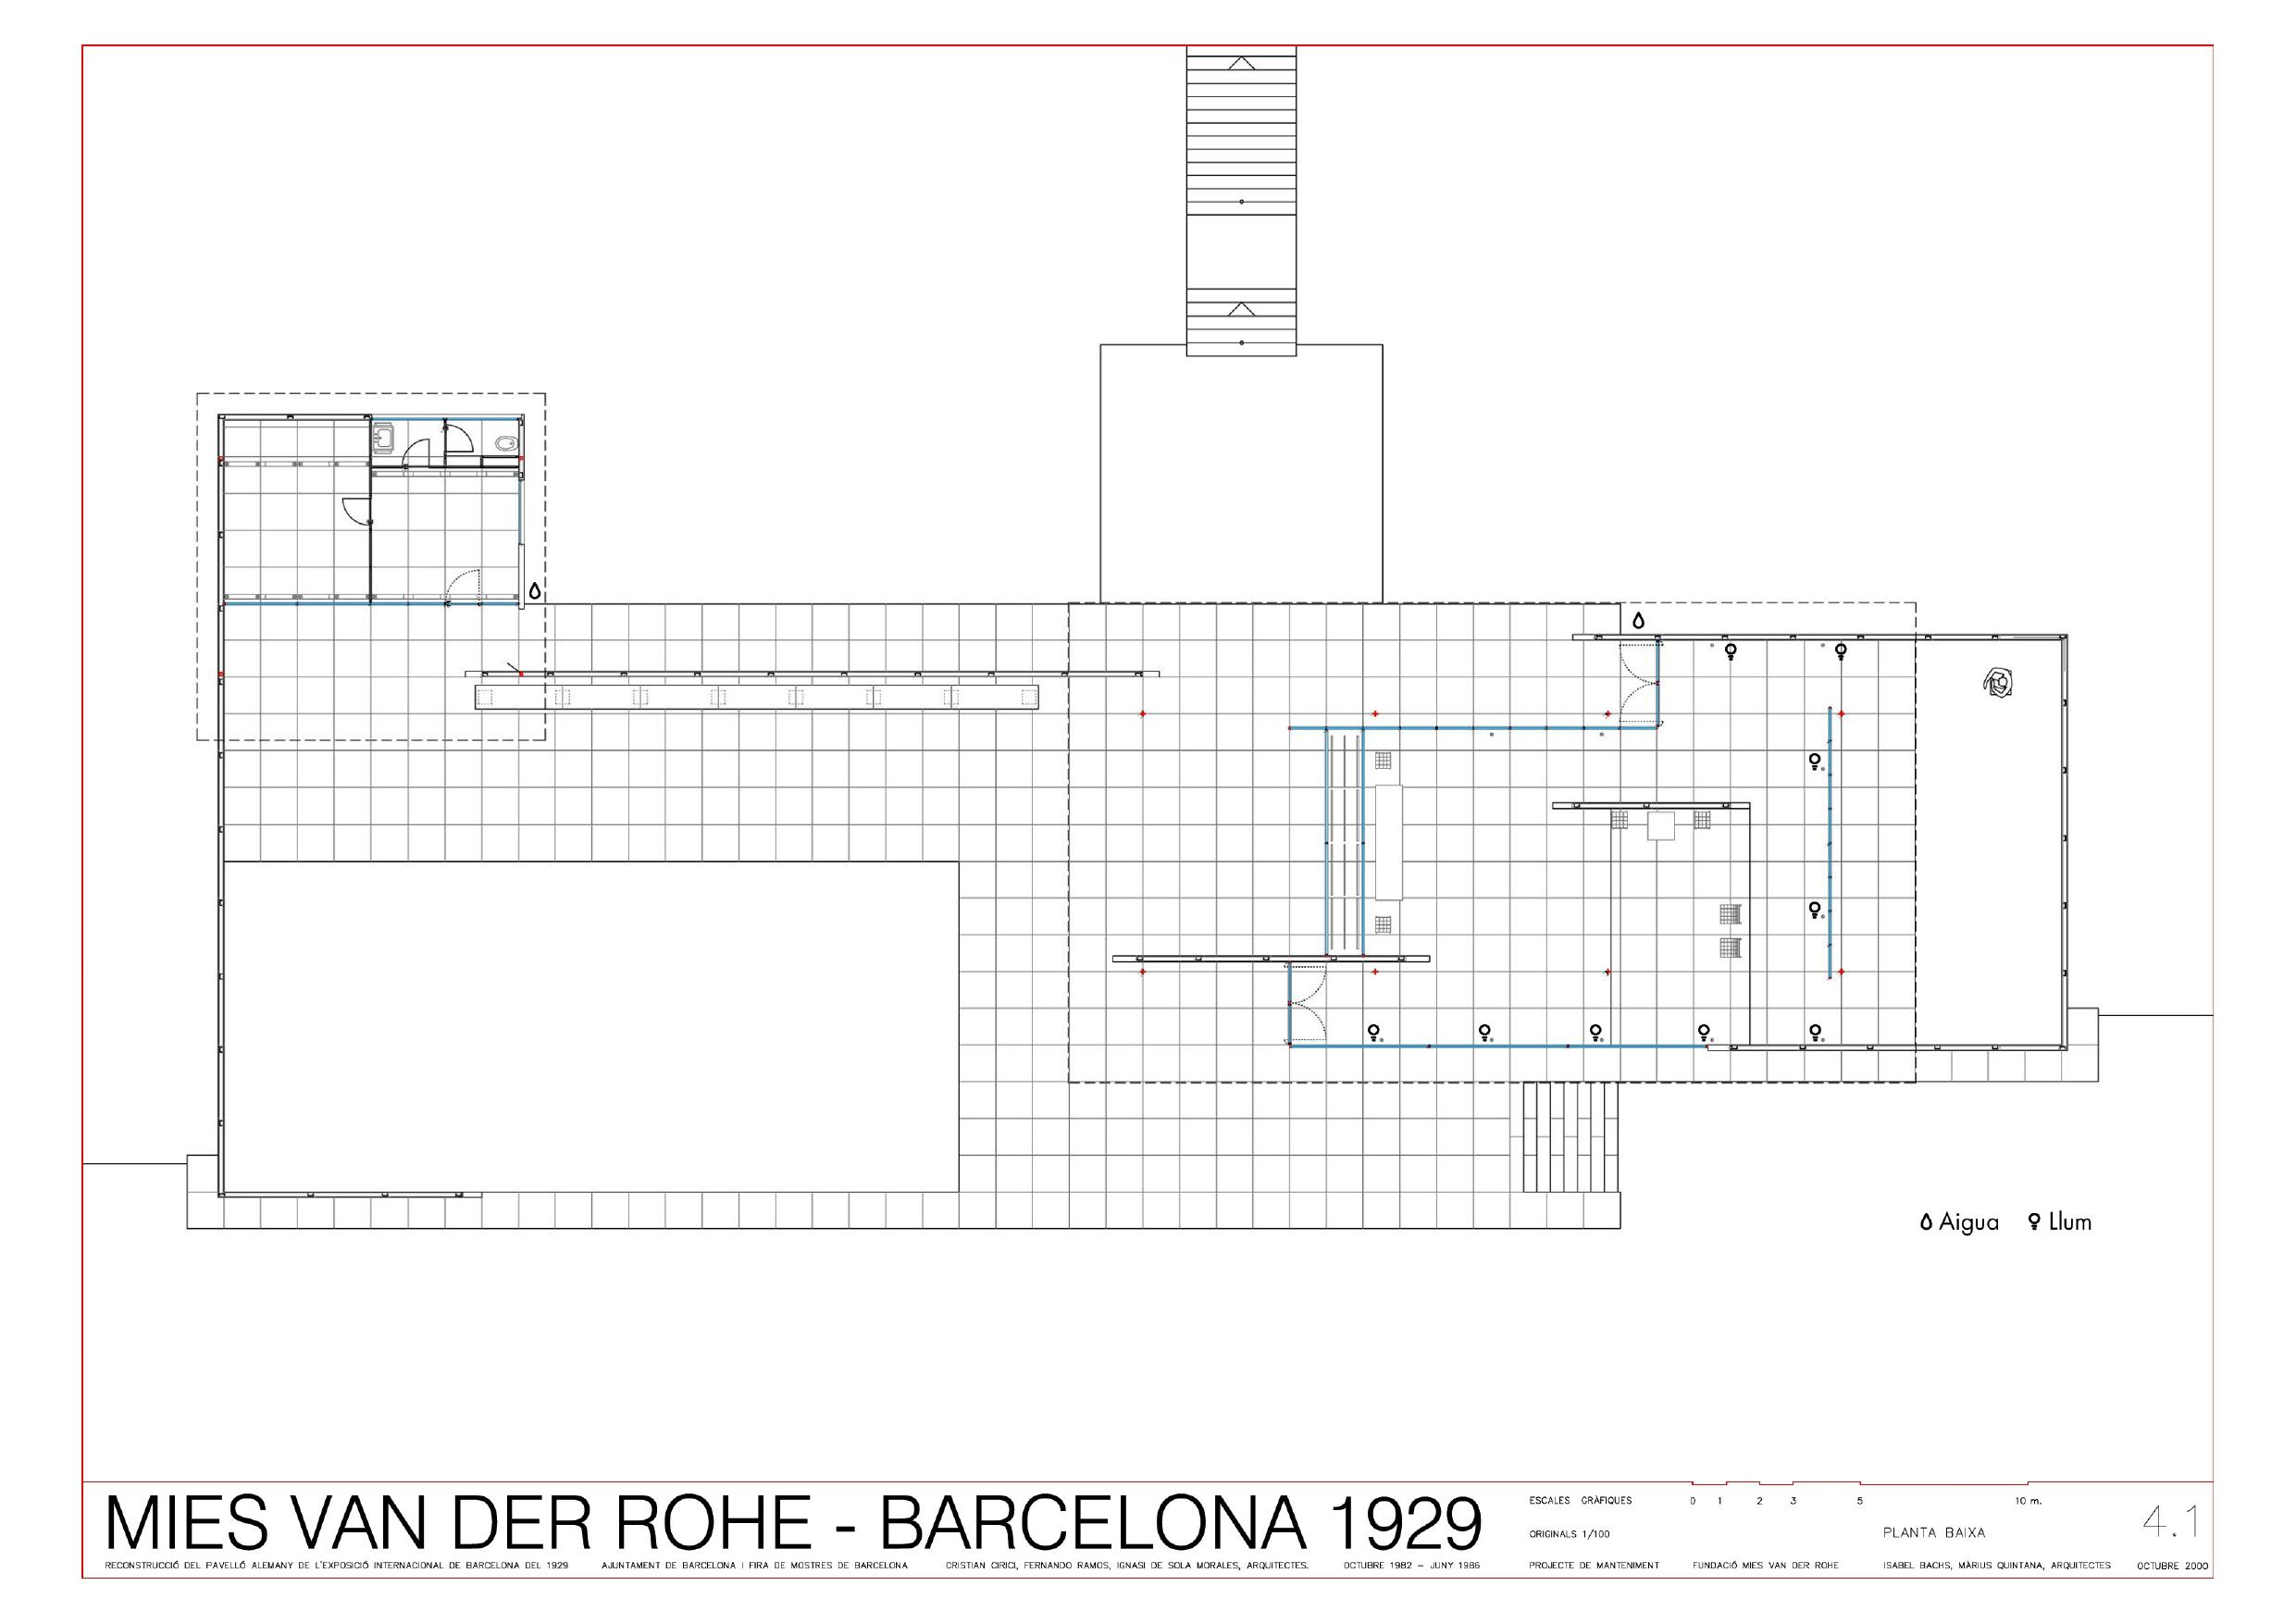 План павильона Германии в Барселоне, 1929.